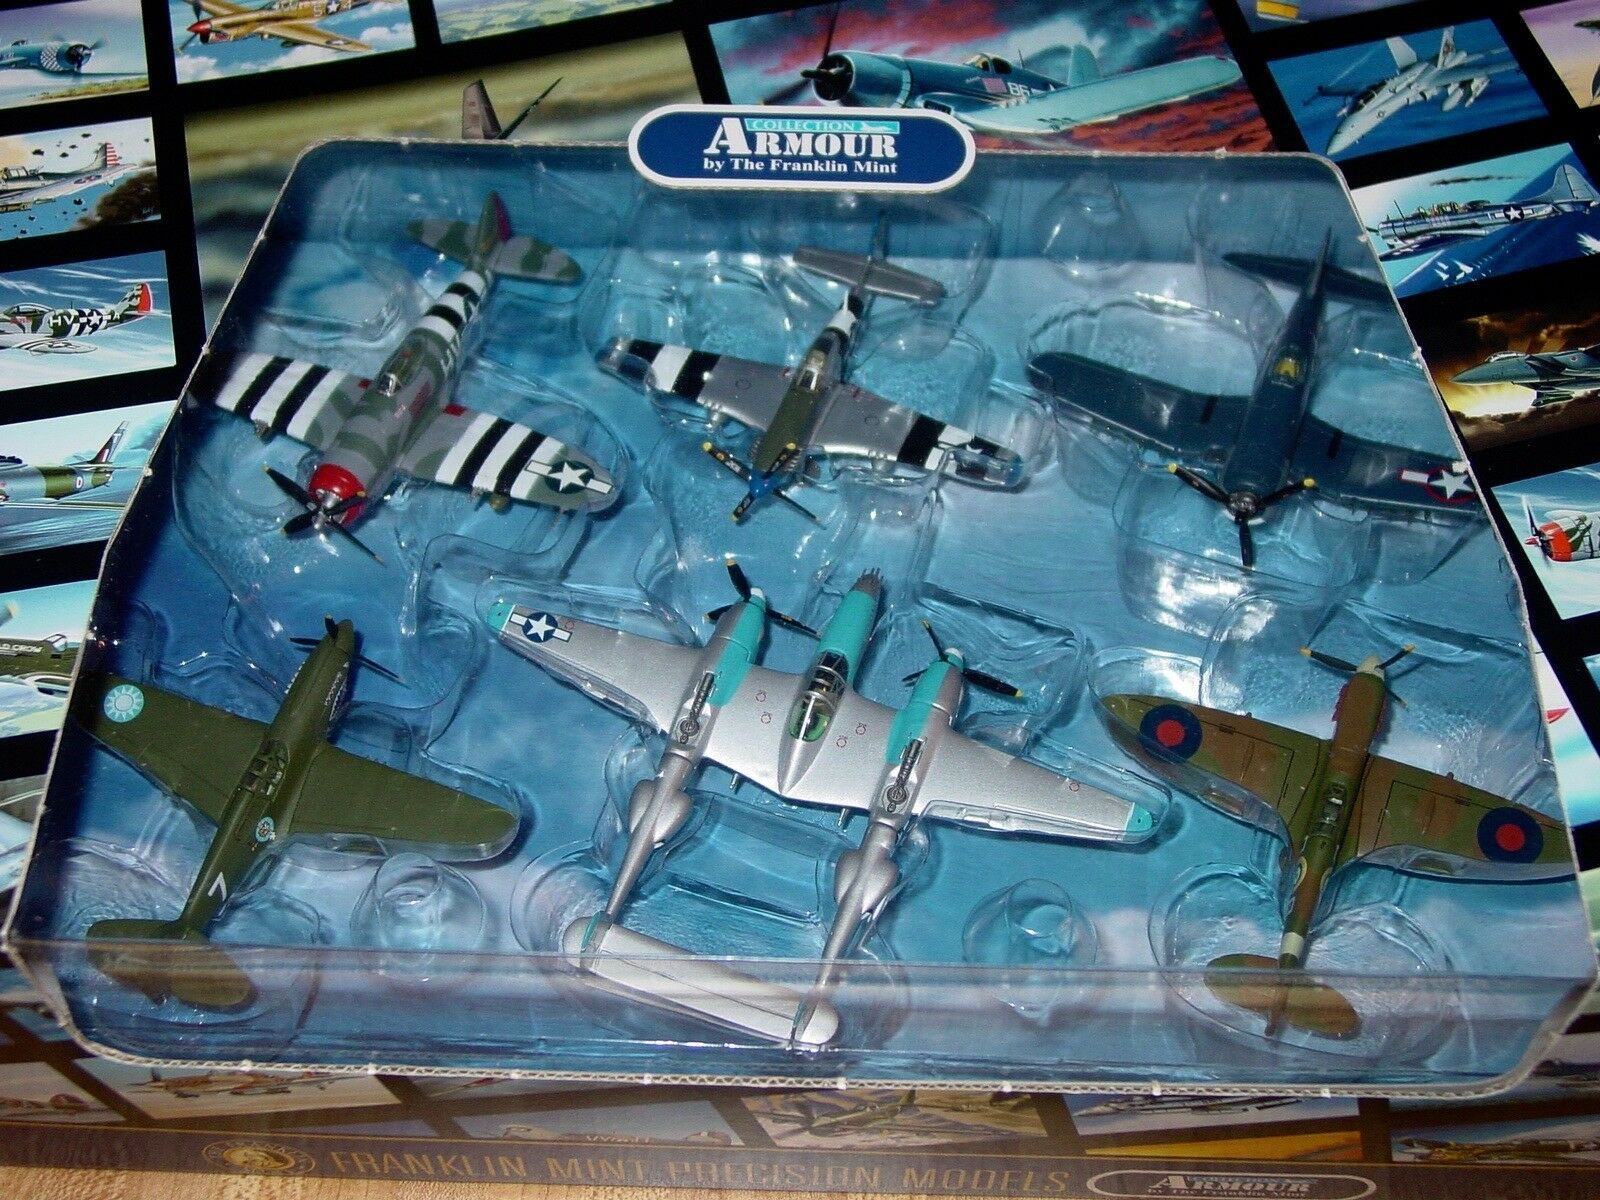 nyA Franklin Mint Armor die-cast 6 plan WWWII Fighters 1 100 skala B11C359